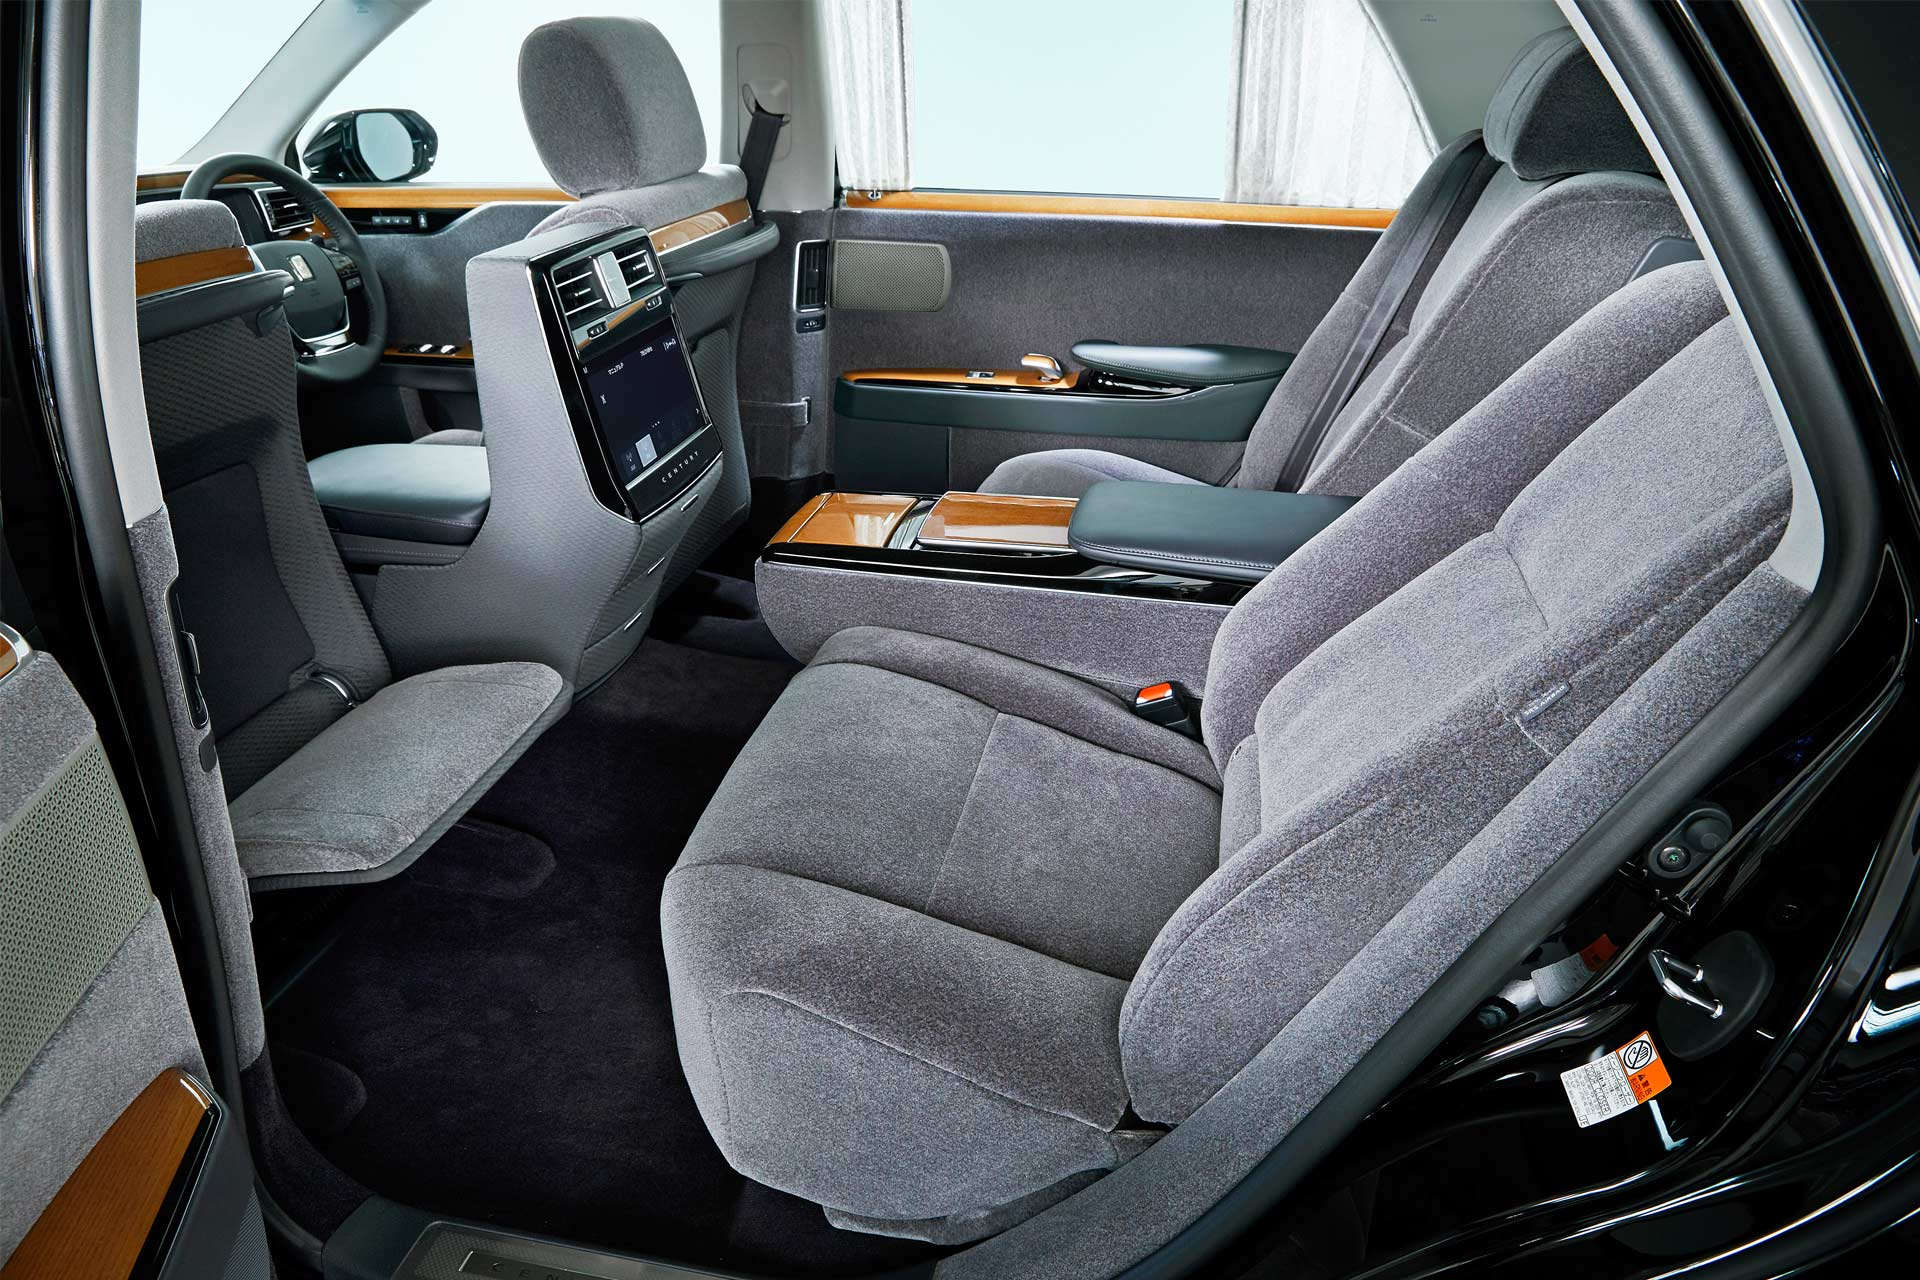 2018-Toyota-Century-interior_5